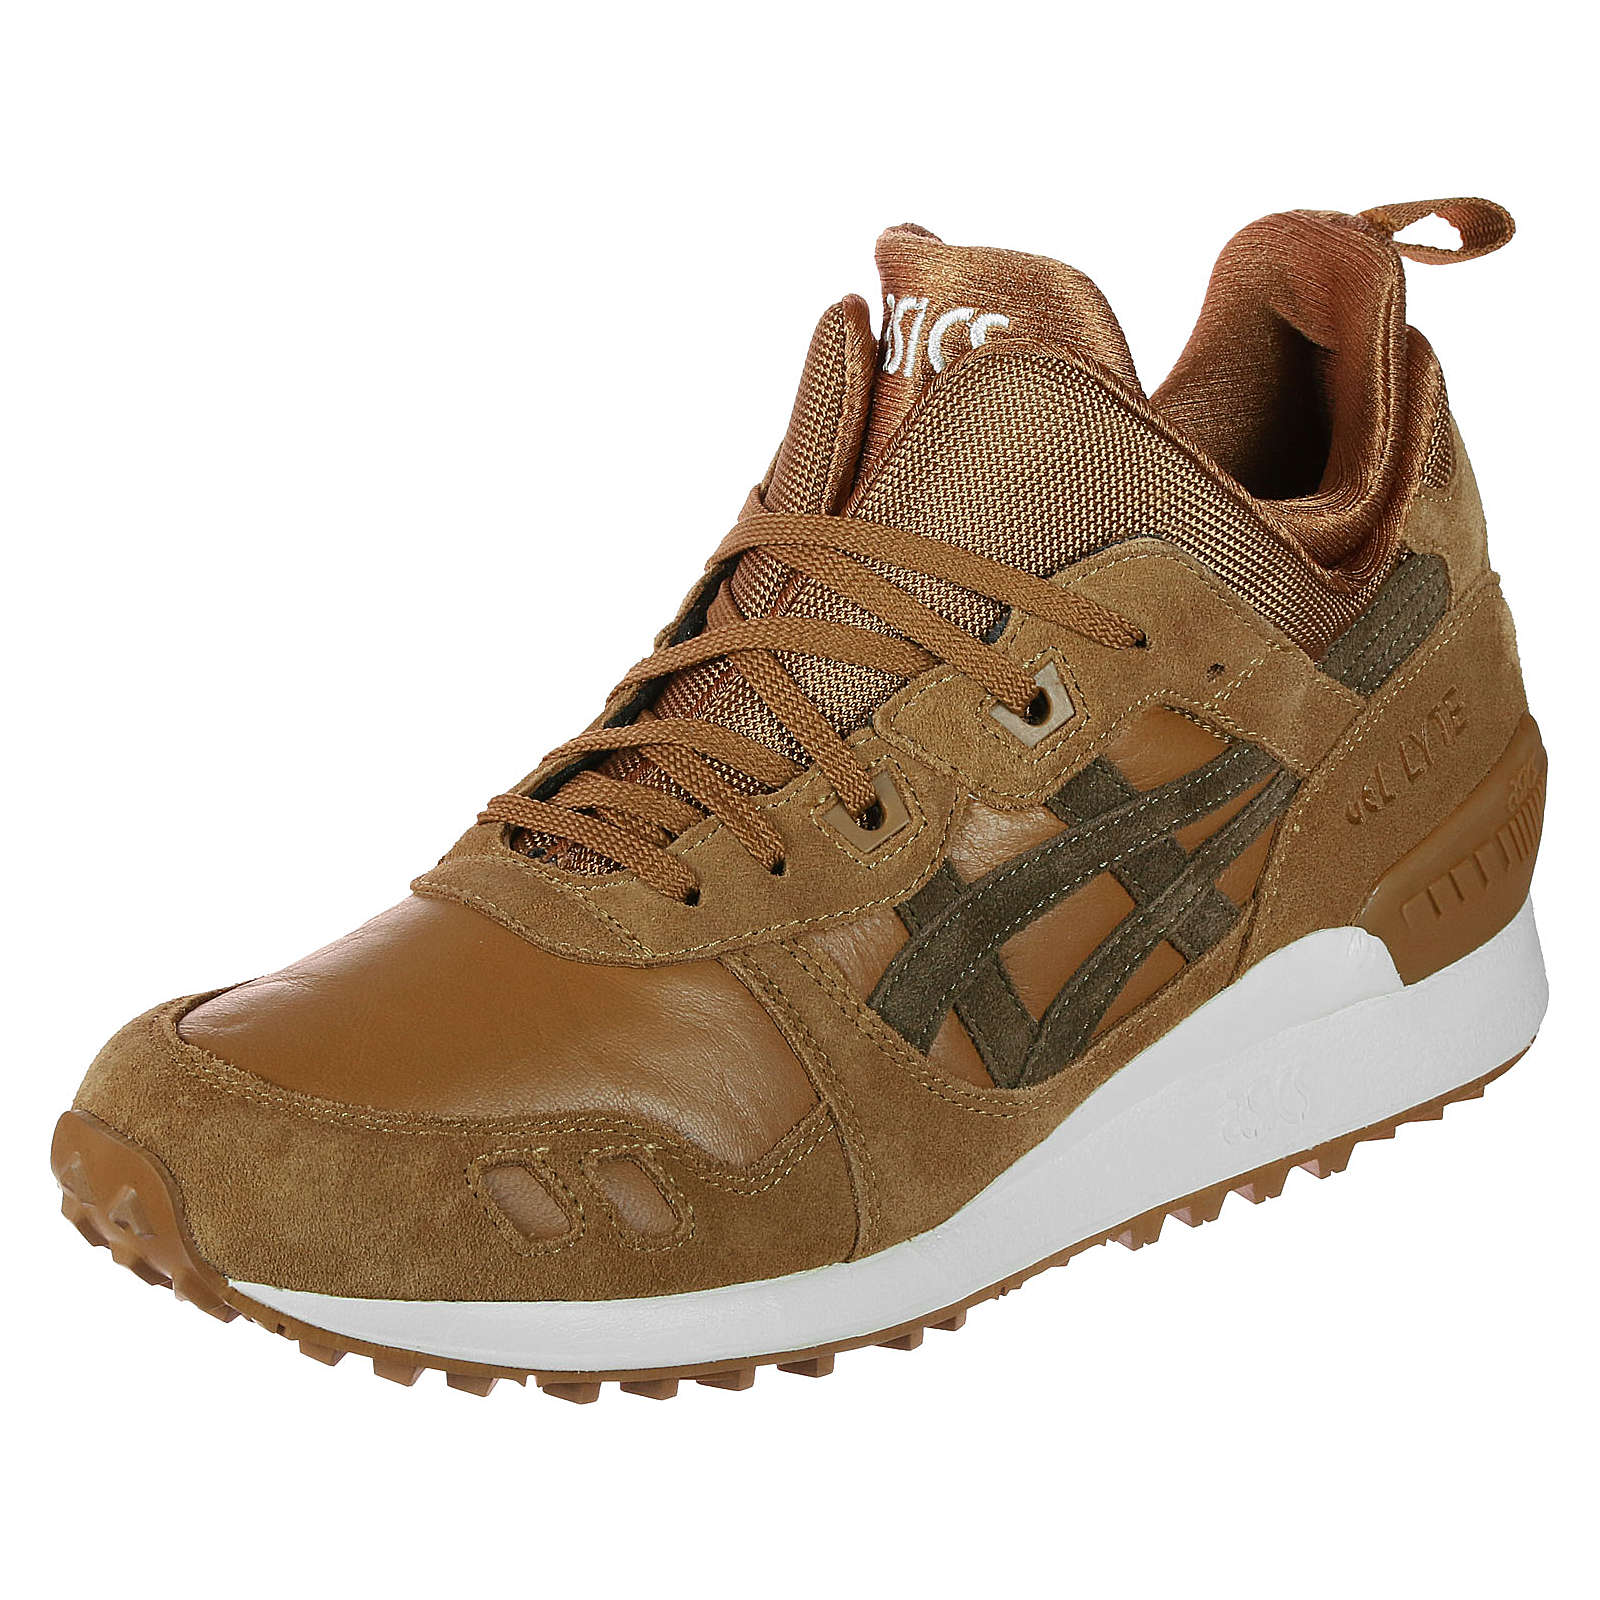 Asics Tiger Sneaker GEL-Lyte MT mit stabilisierender Fersenkammer Sneakers Low braun Herren Gr. 42